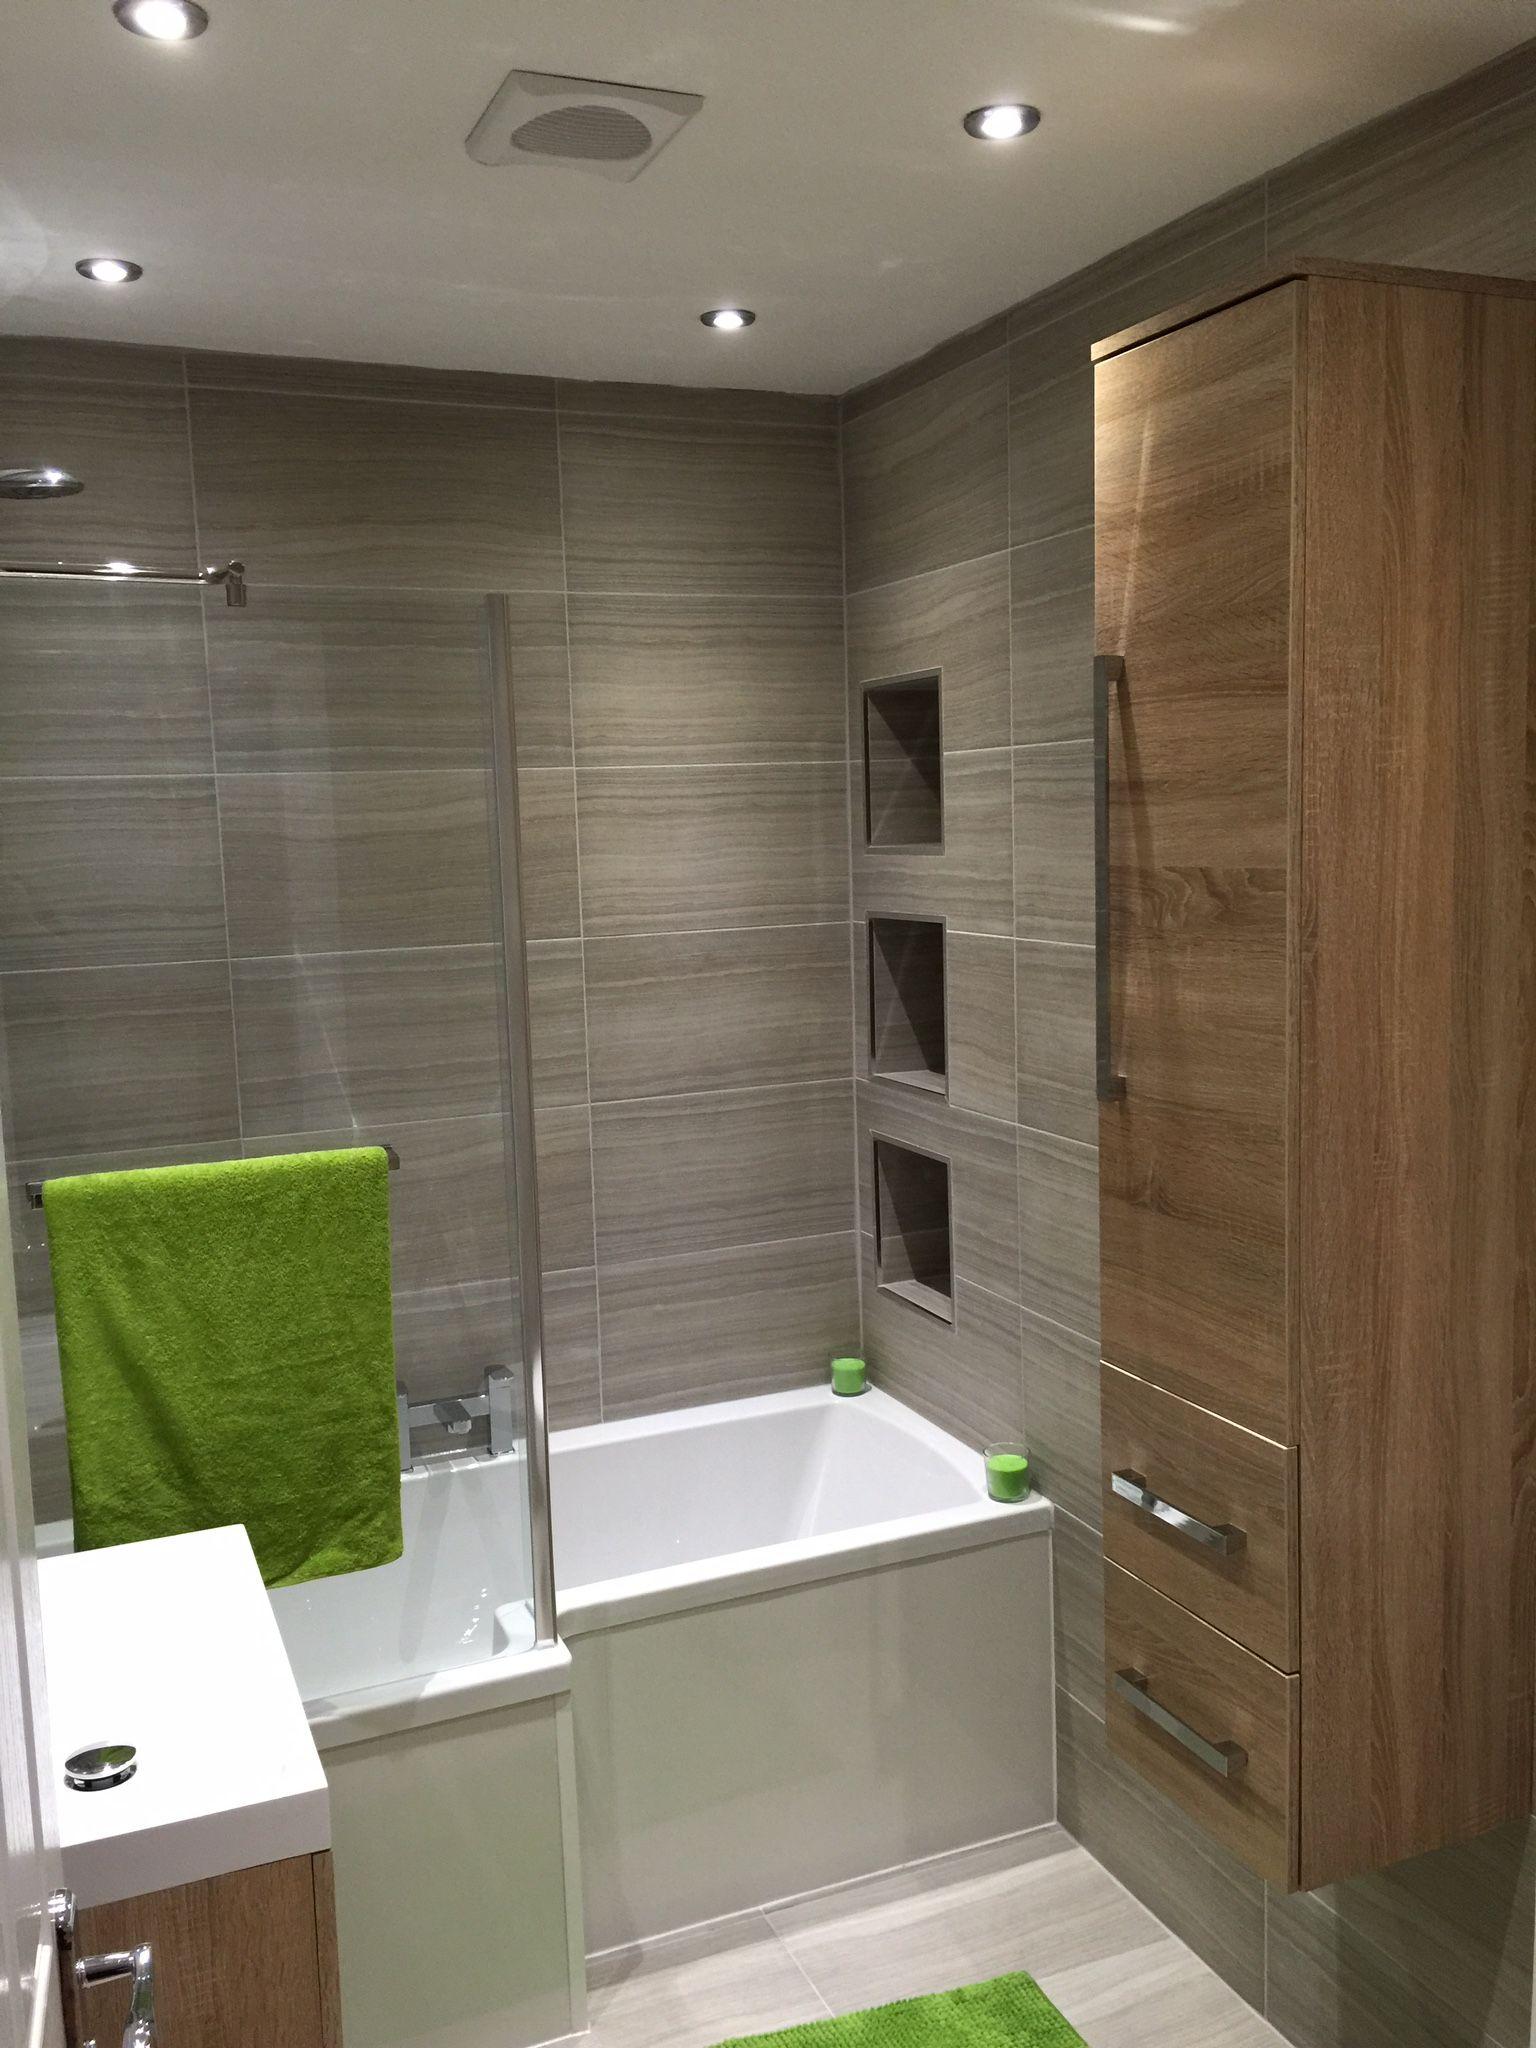 13 Best Bathroom Remodel Ideas Makeovers Design Bath Small